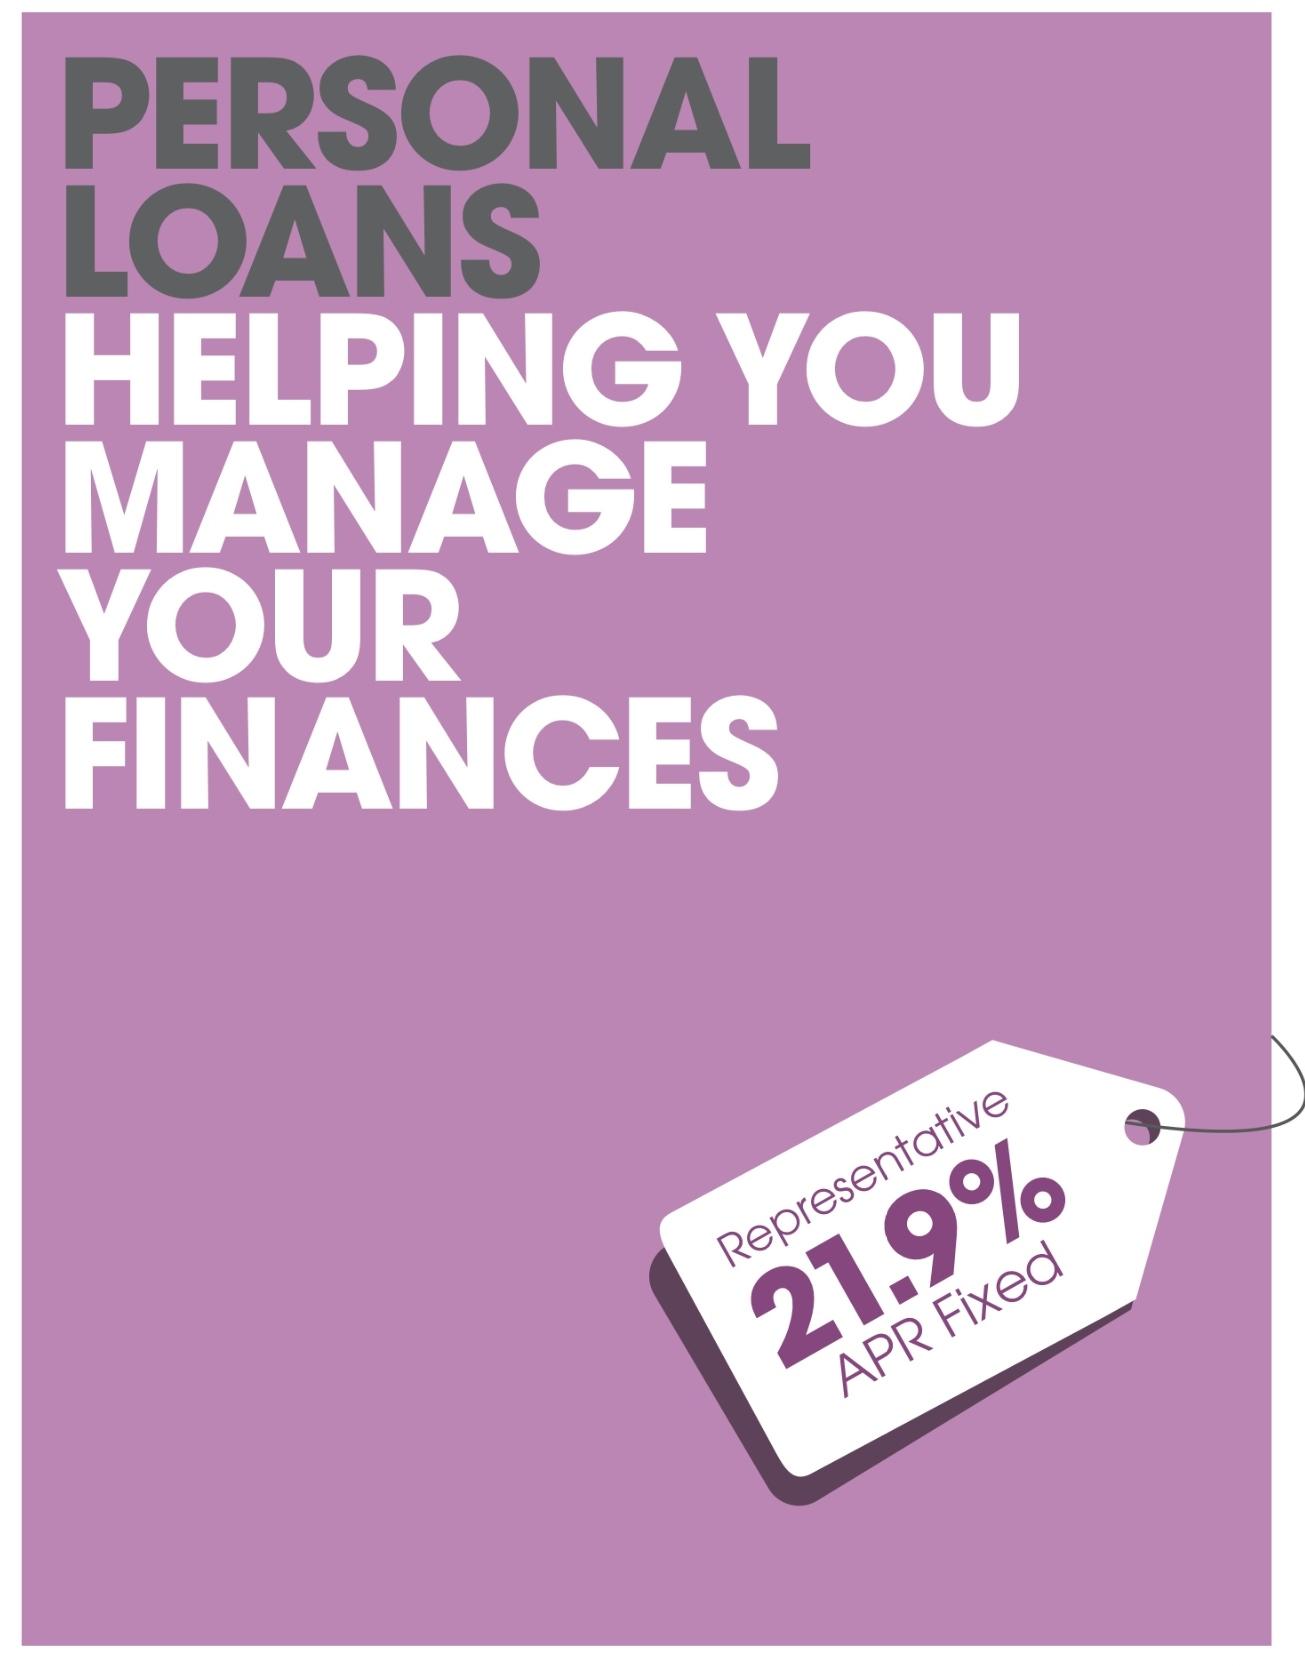 personal loans.jpg